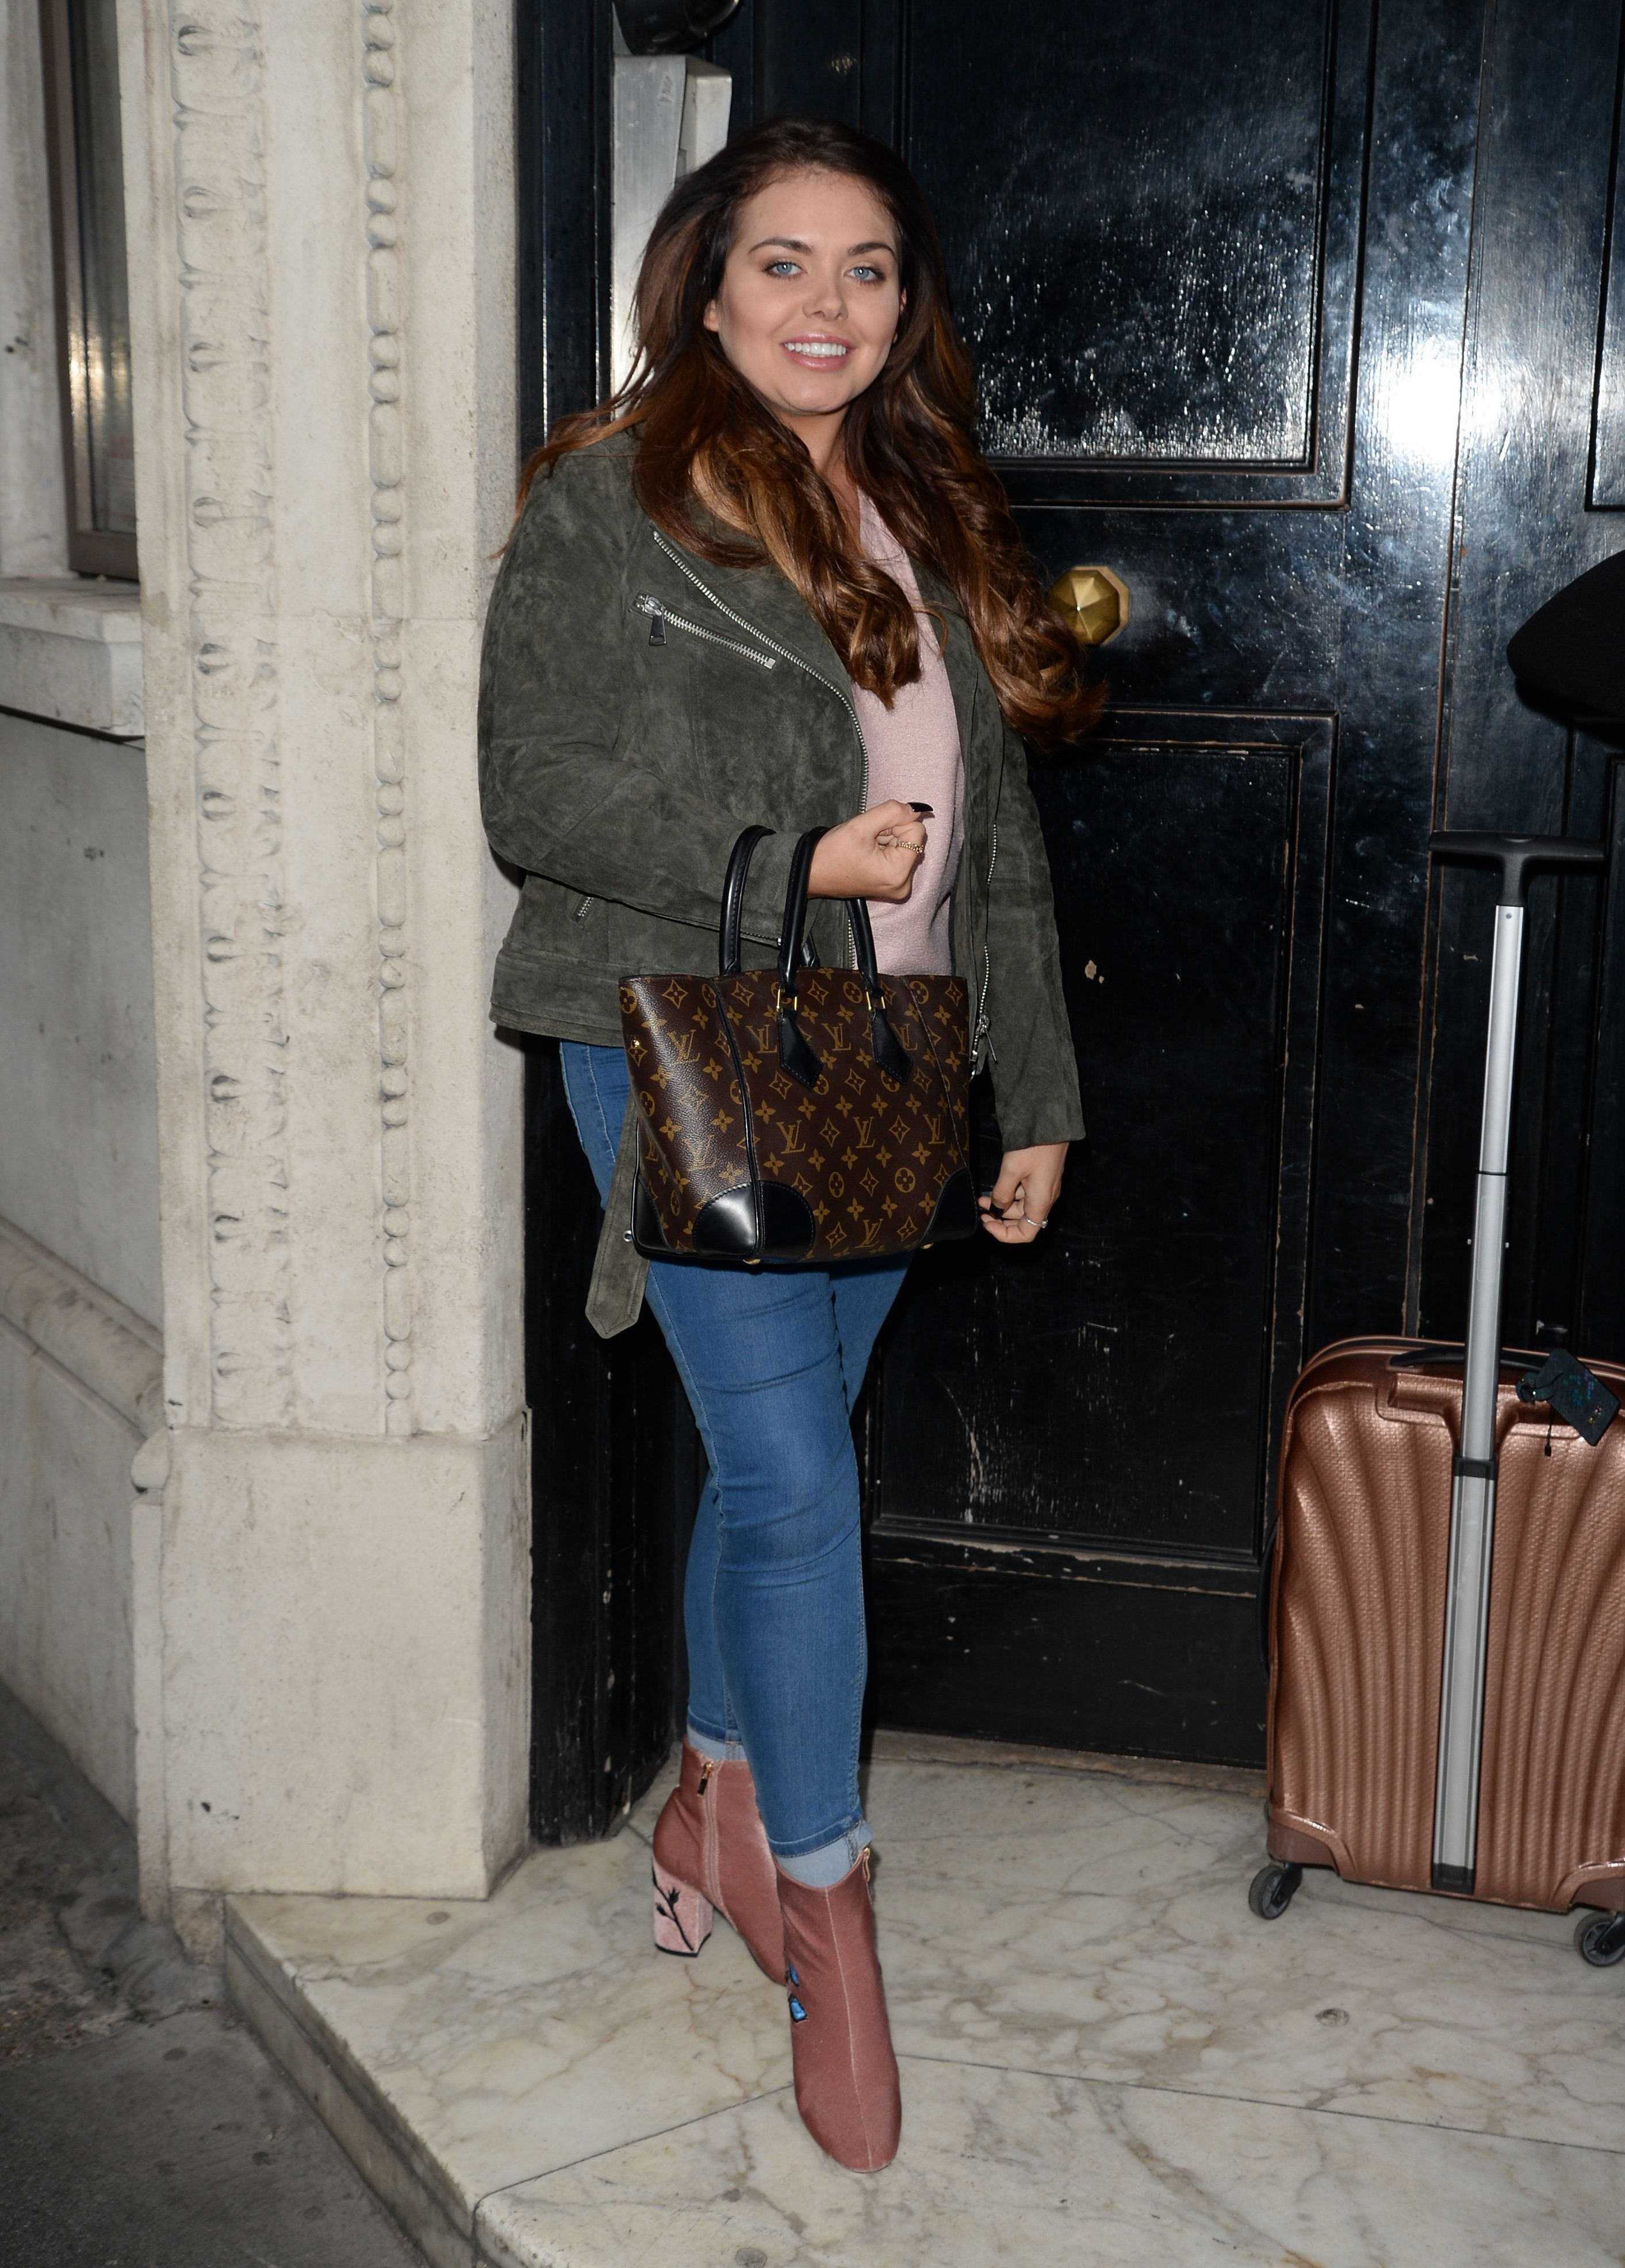 Scarlett Moffatt Admits She Was 'Miserable' After Losing Three Stone On